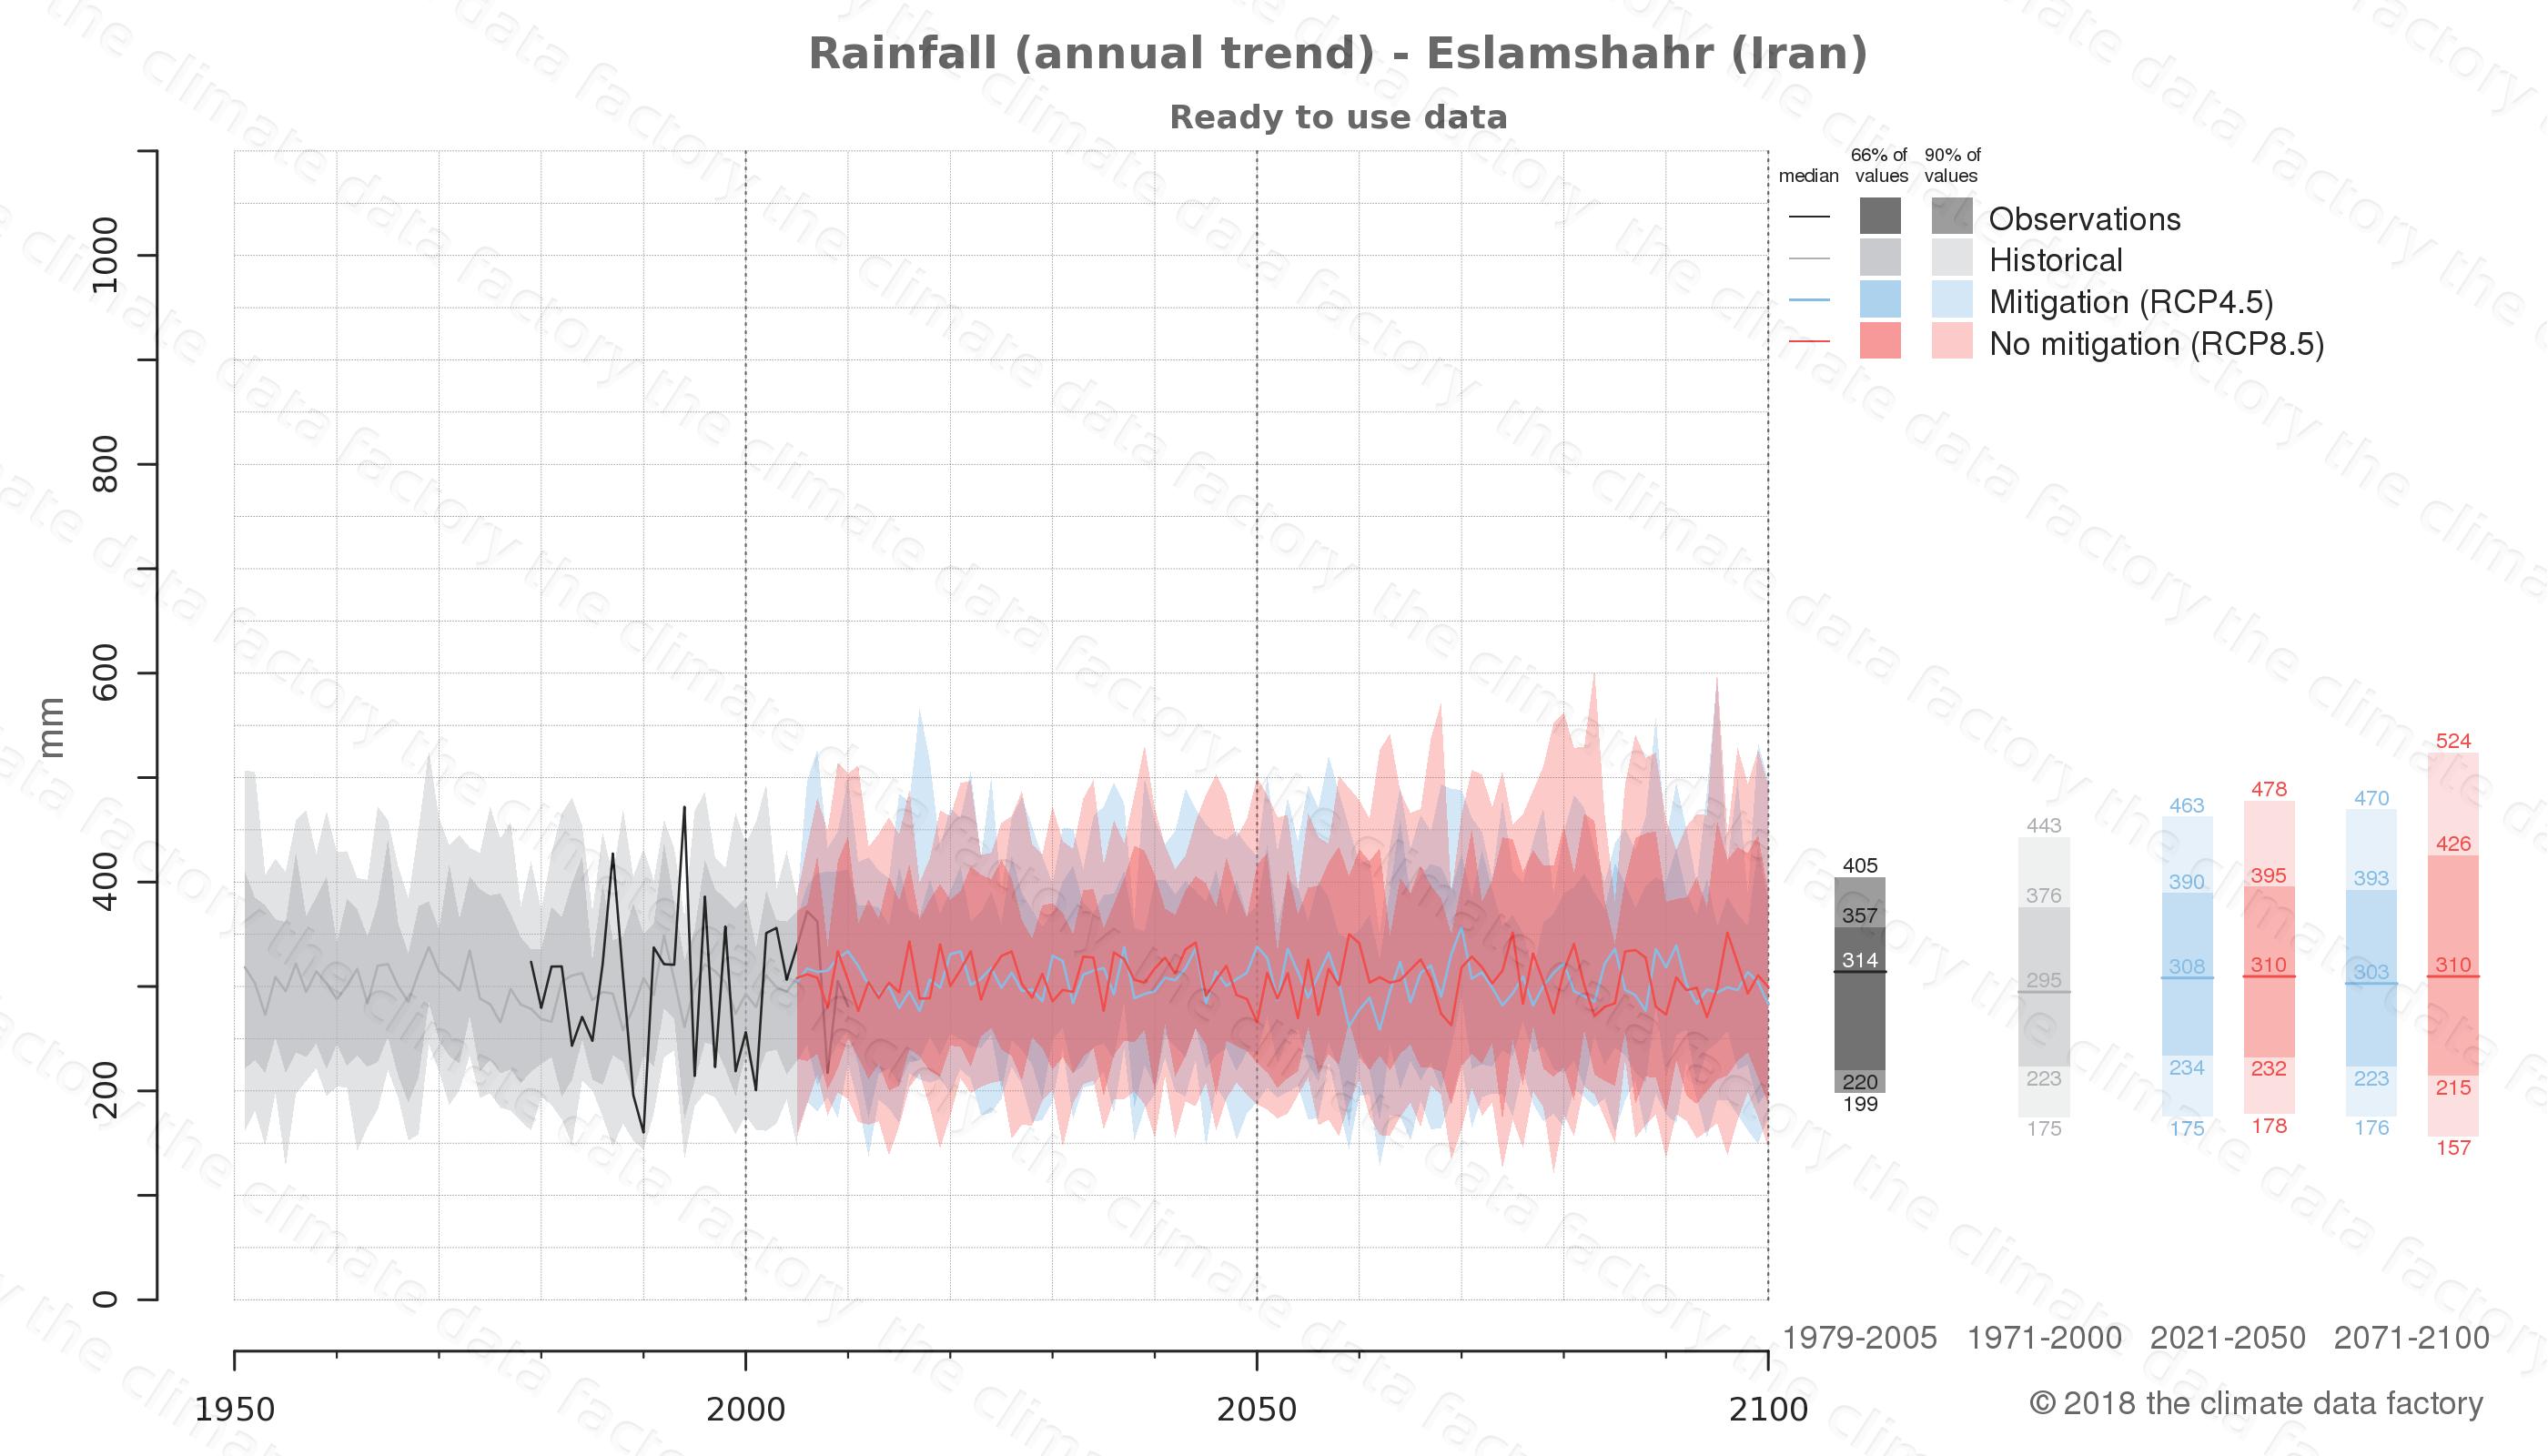 climate change data policy adaptation climate graph city data rainfall eslamshahr iran